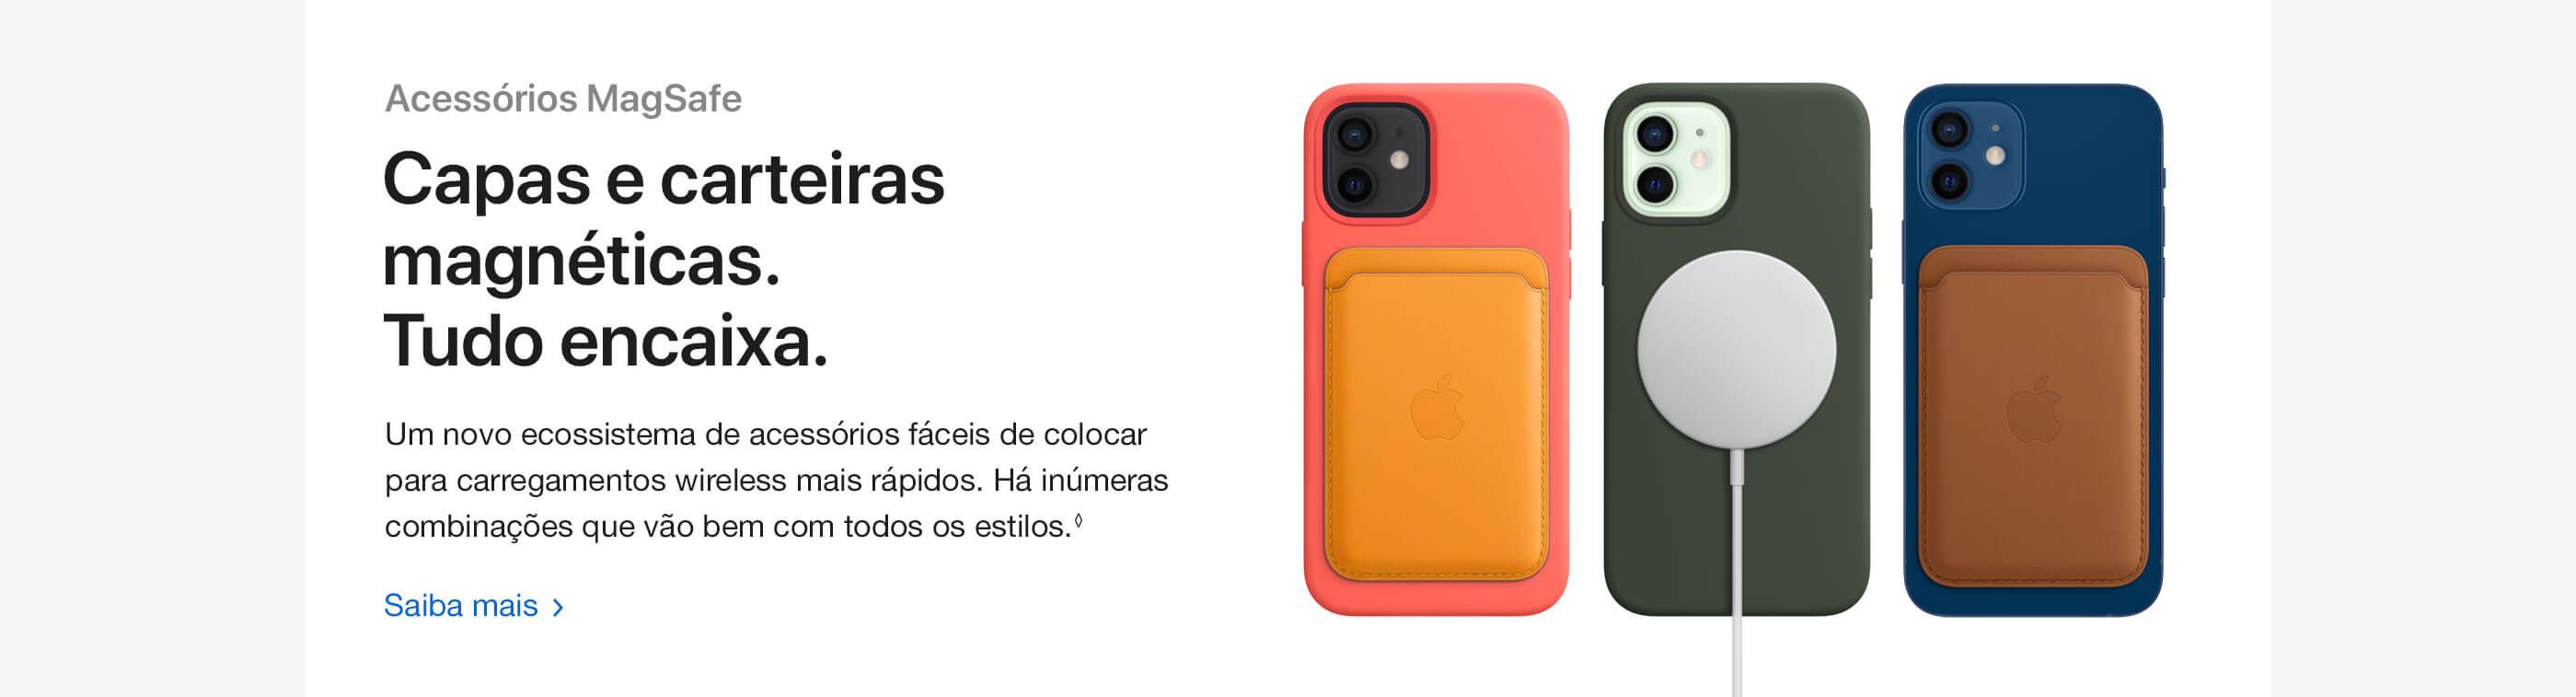 iPhone 12 e iPhone 12 Mini Acessórios MagSafe